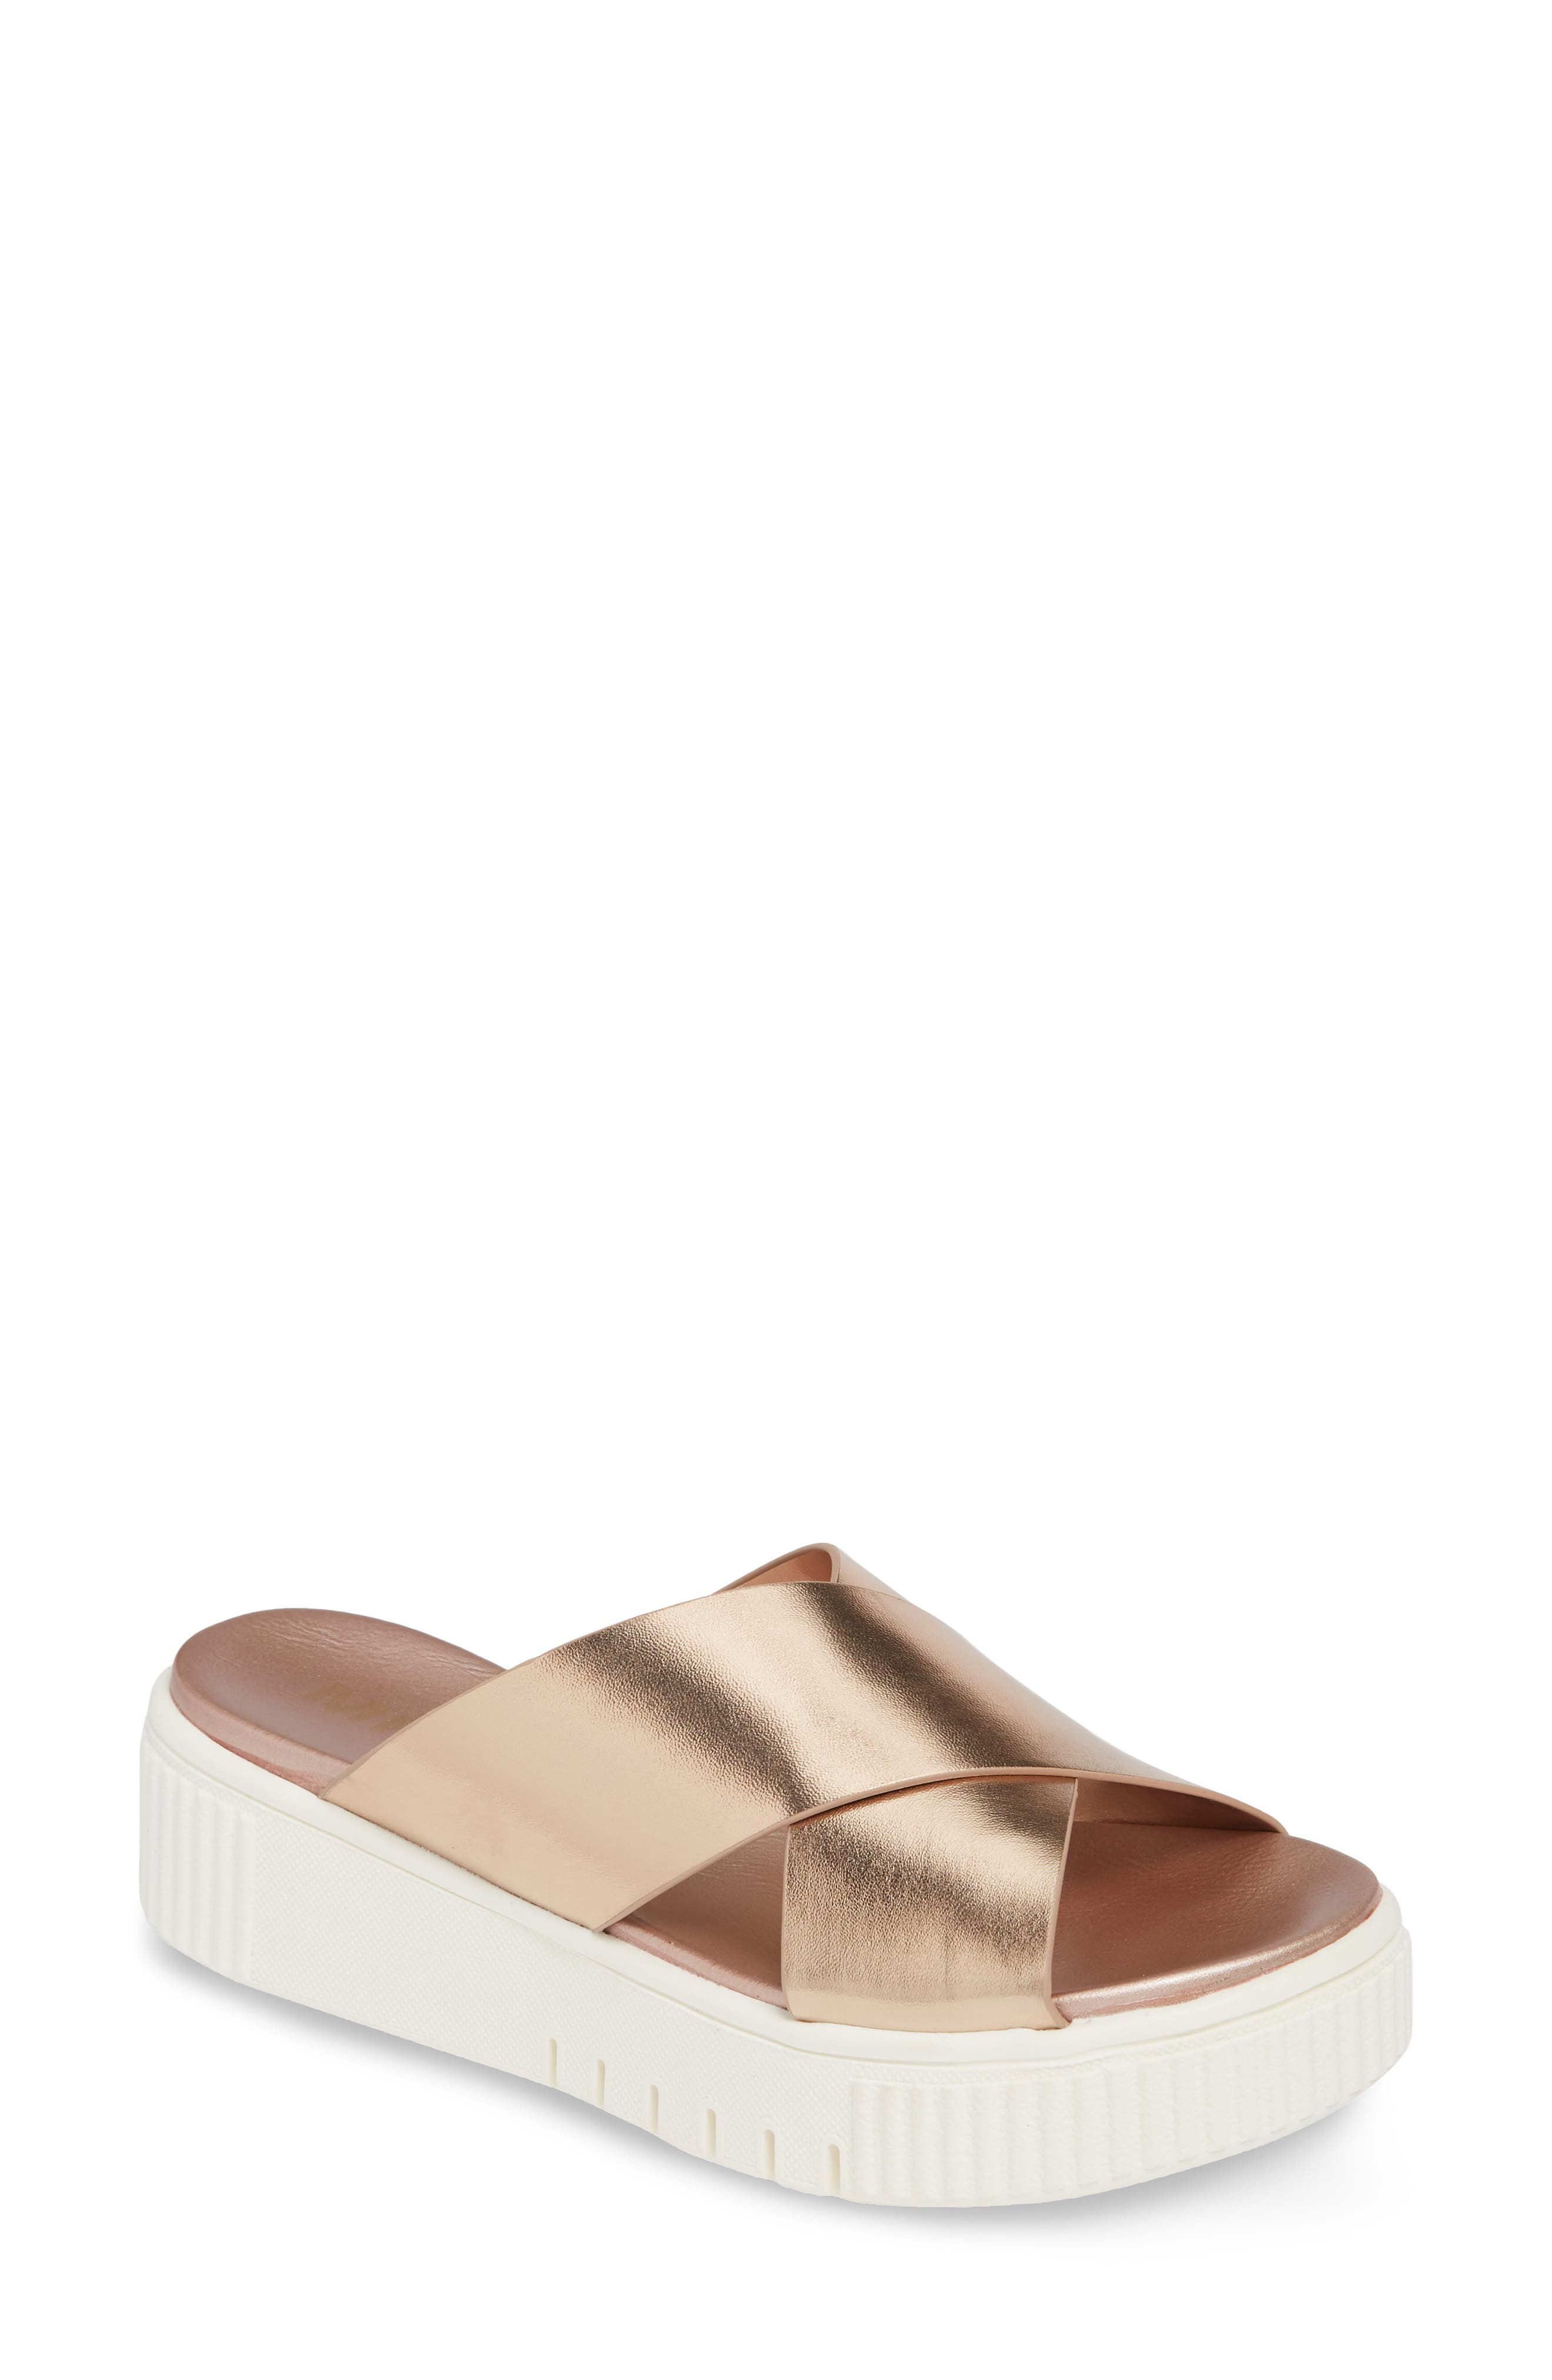 Mia Lia Platform Sandal, Metallic